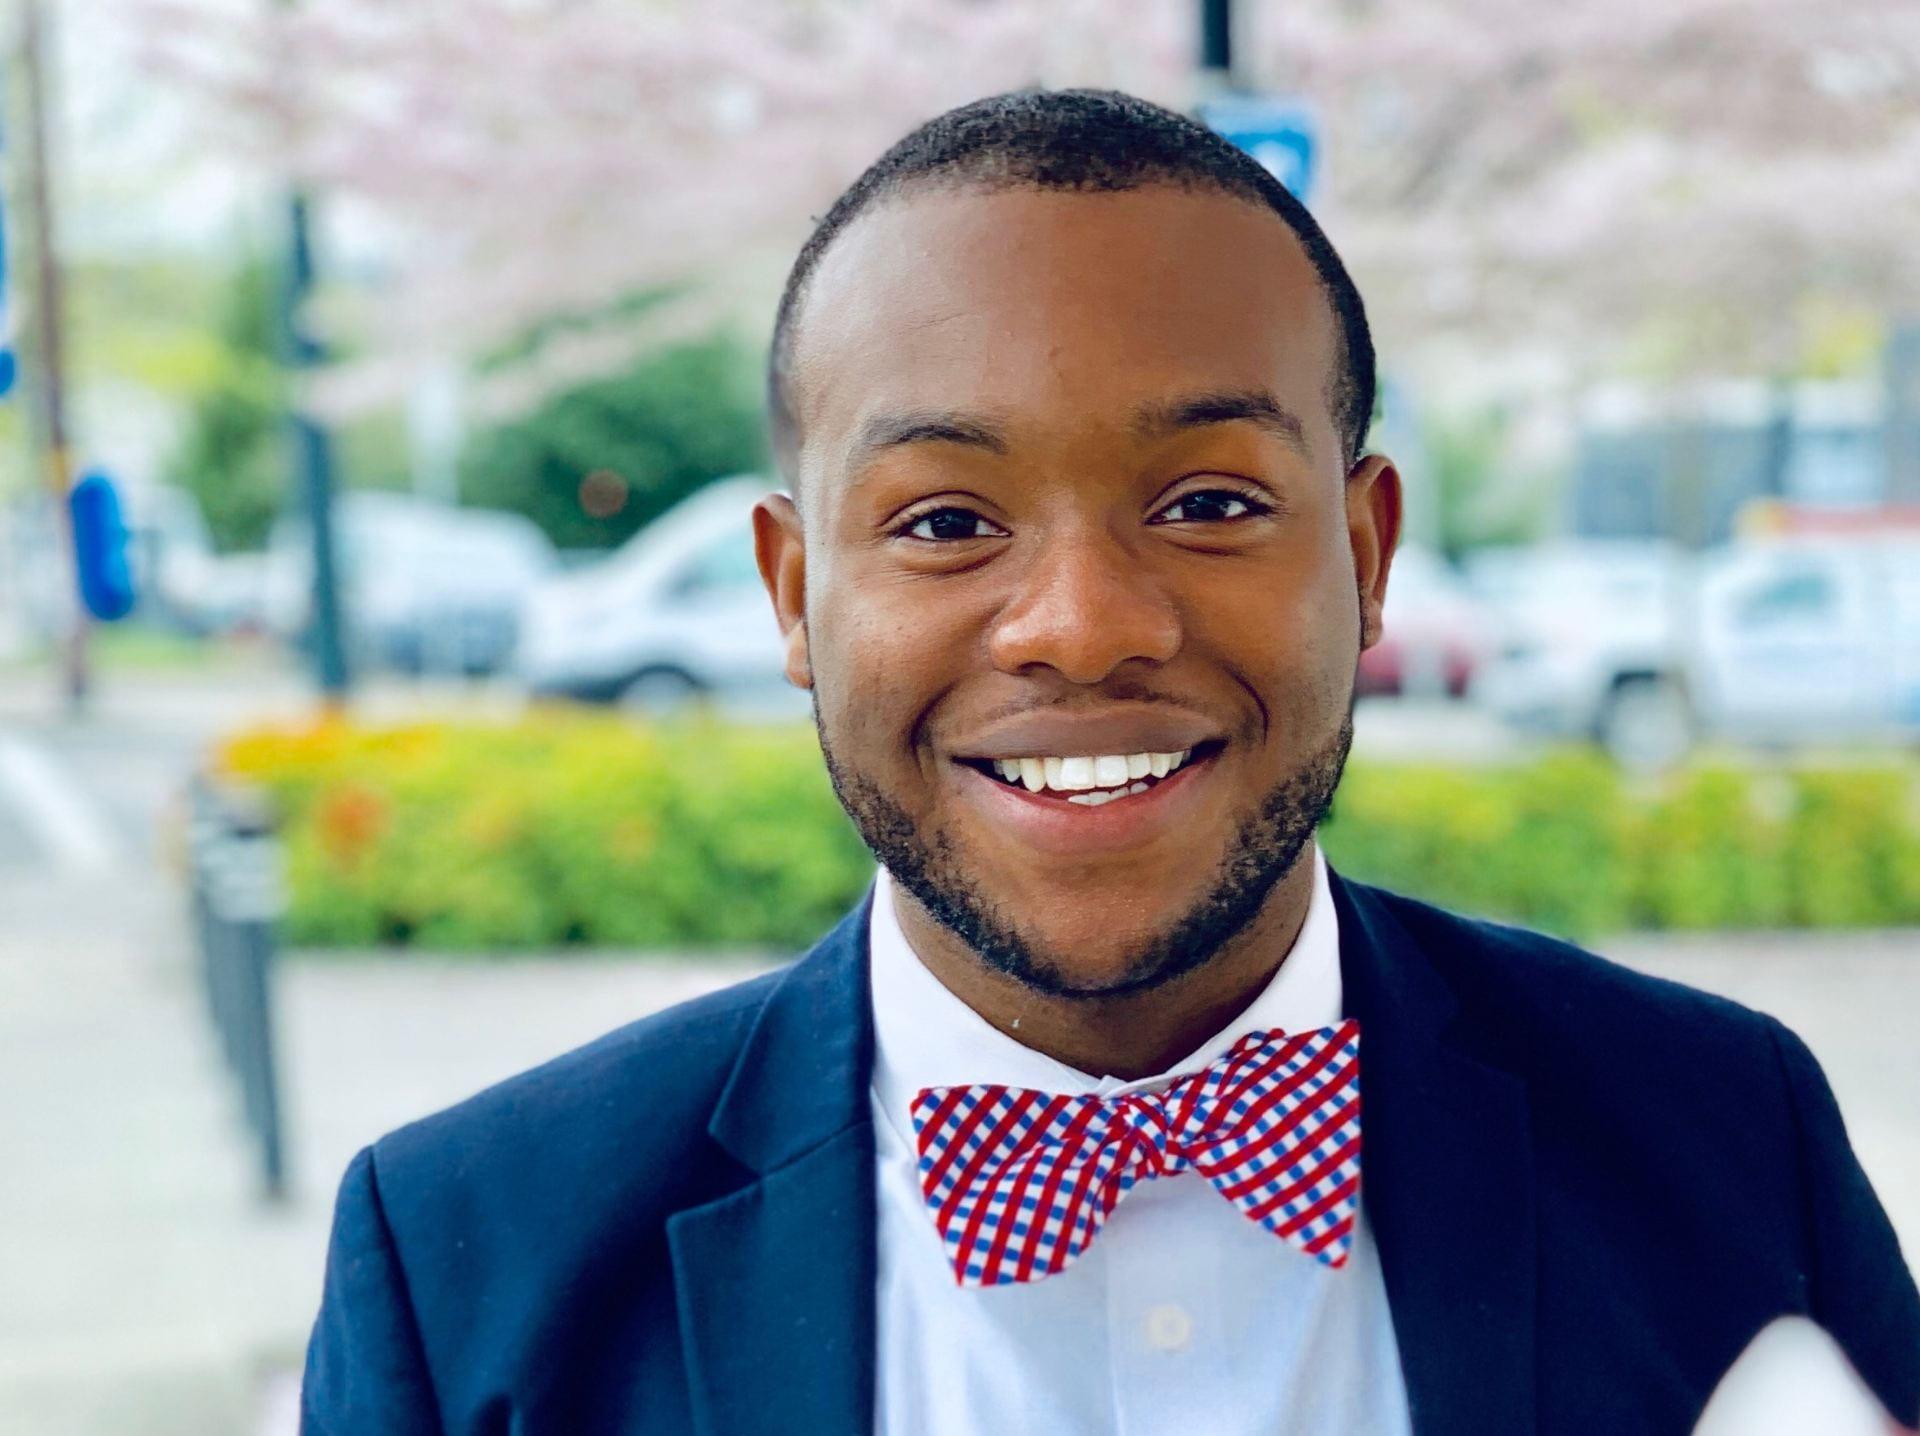 David Jefferson, Urban and Public Affairs Graduate Student